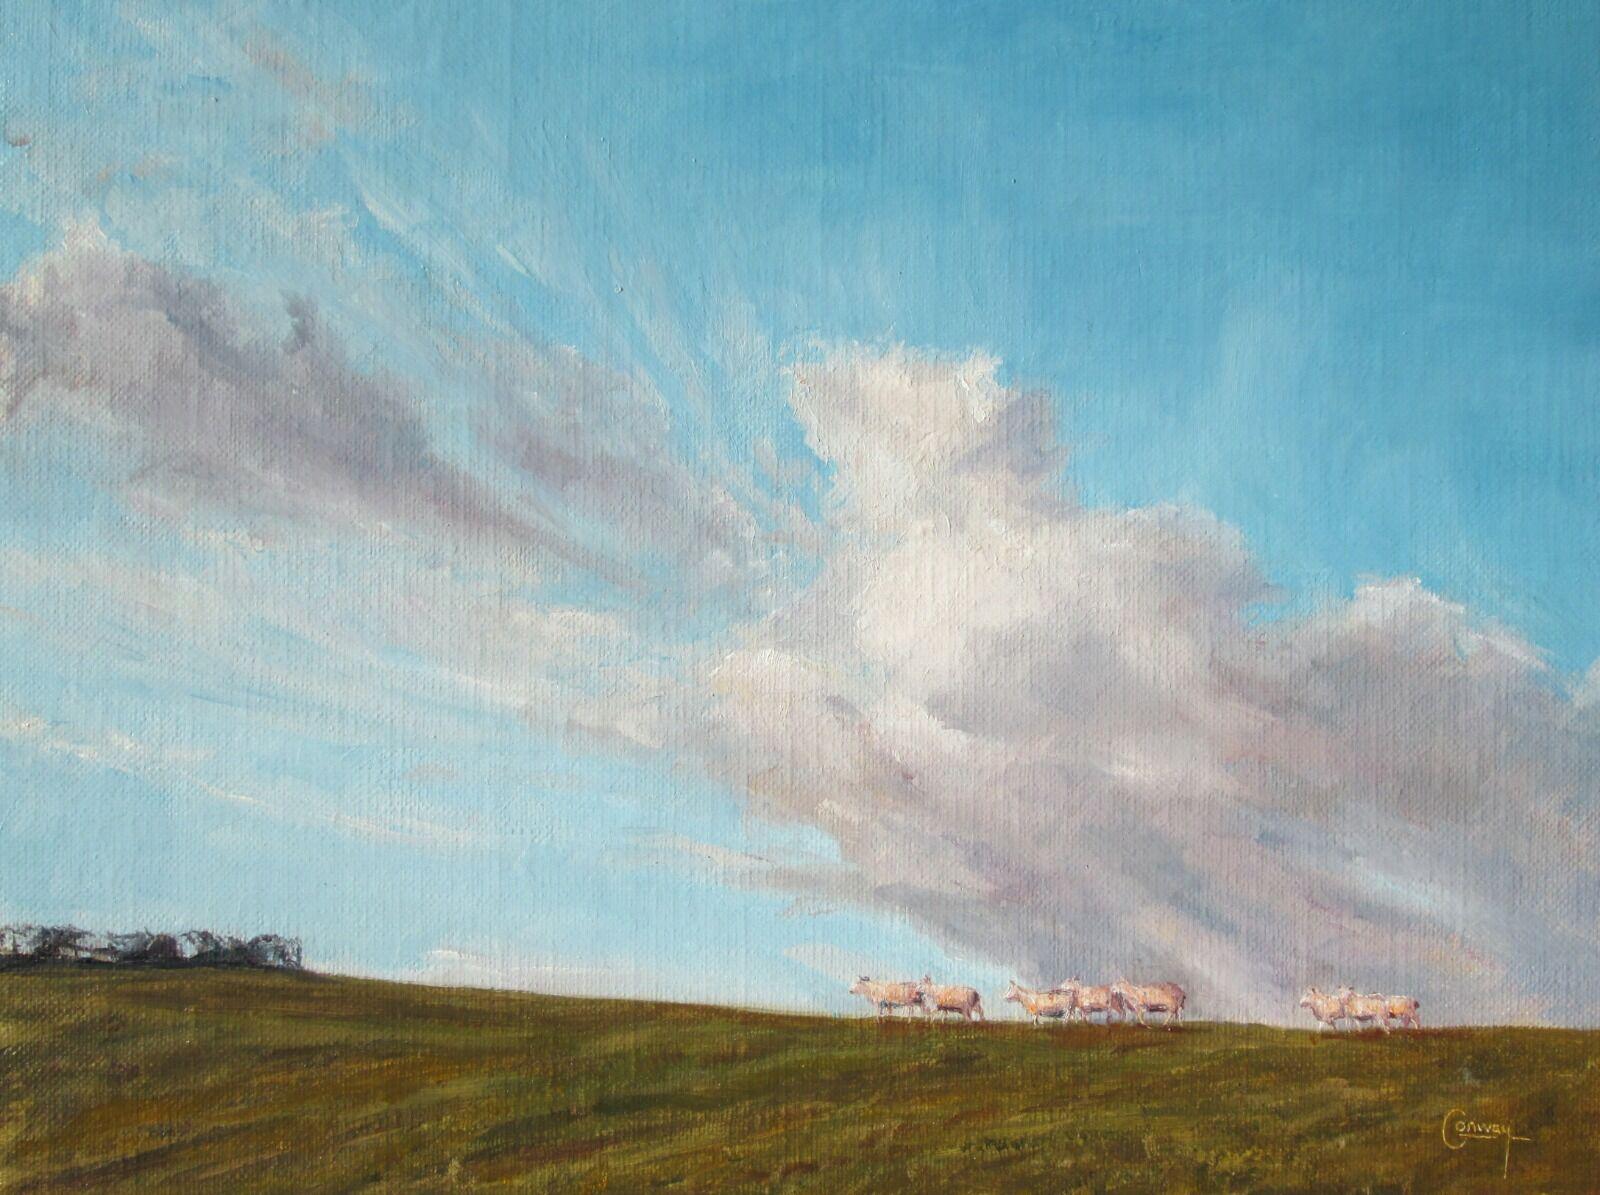 Painting of sheep walking along skyline.